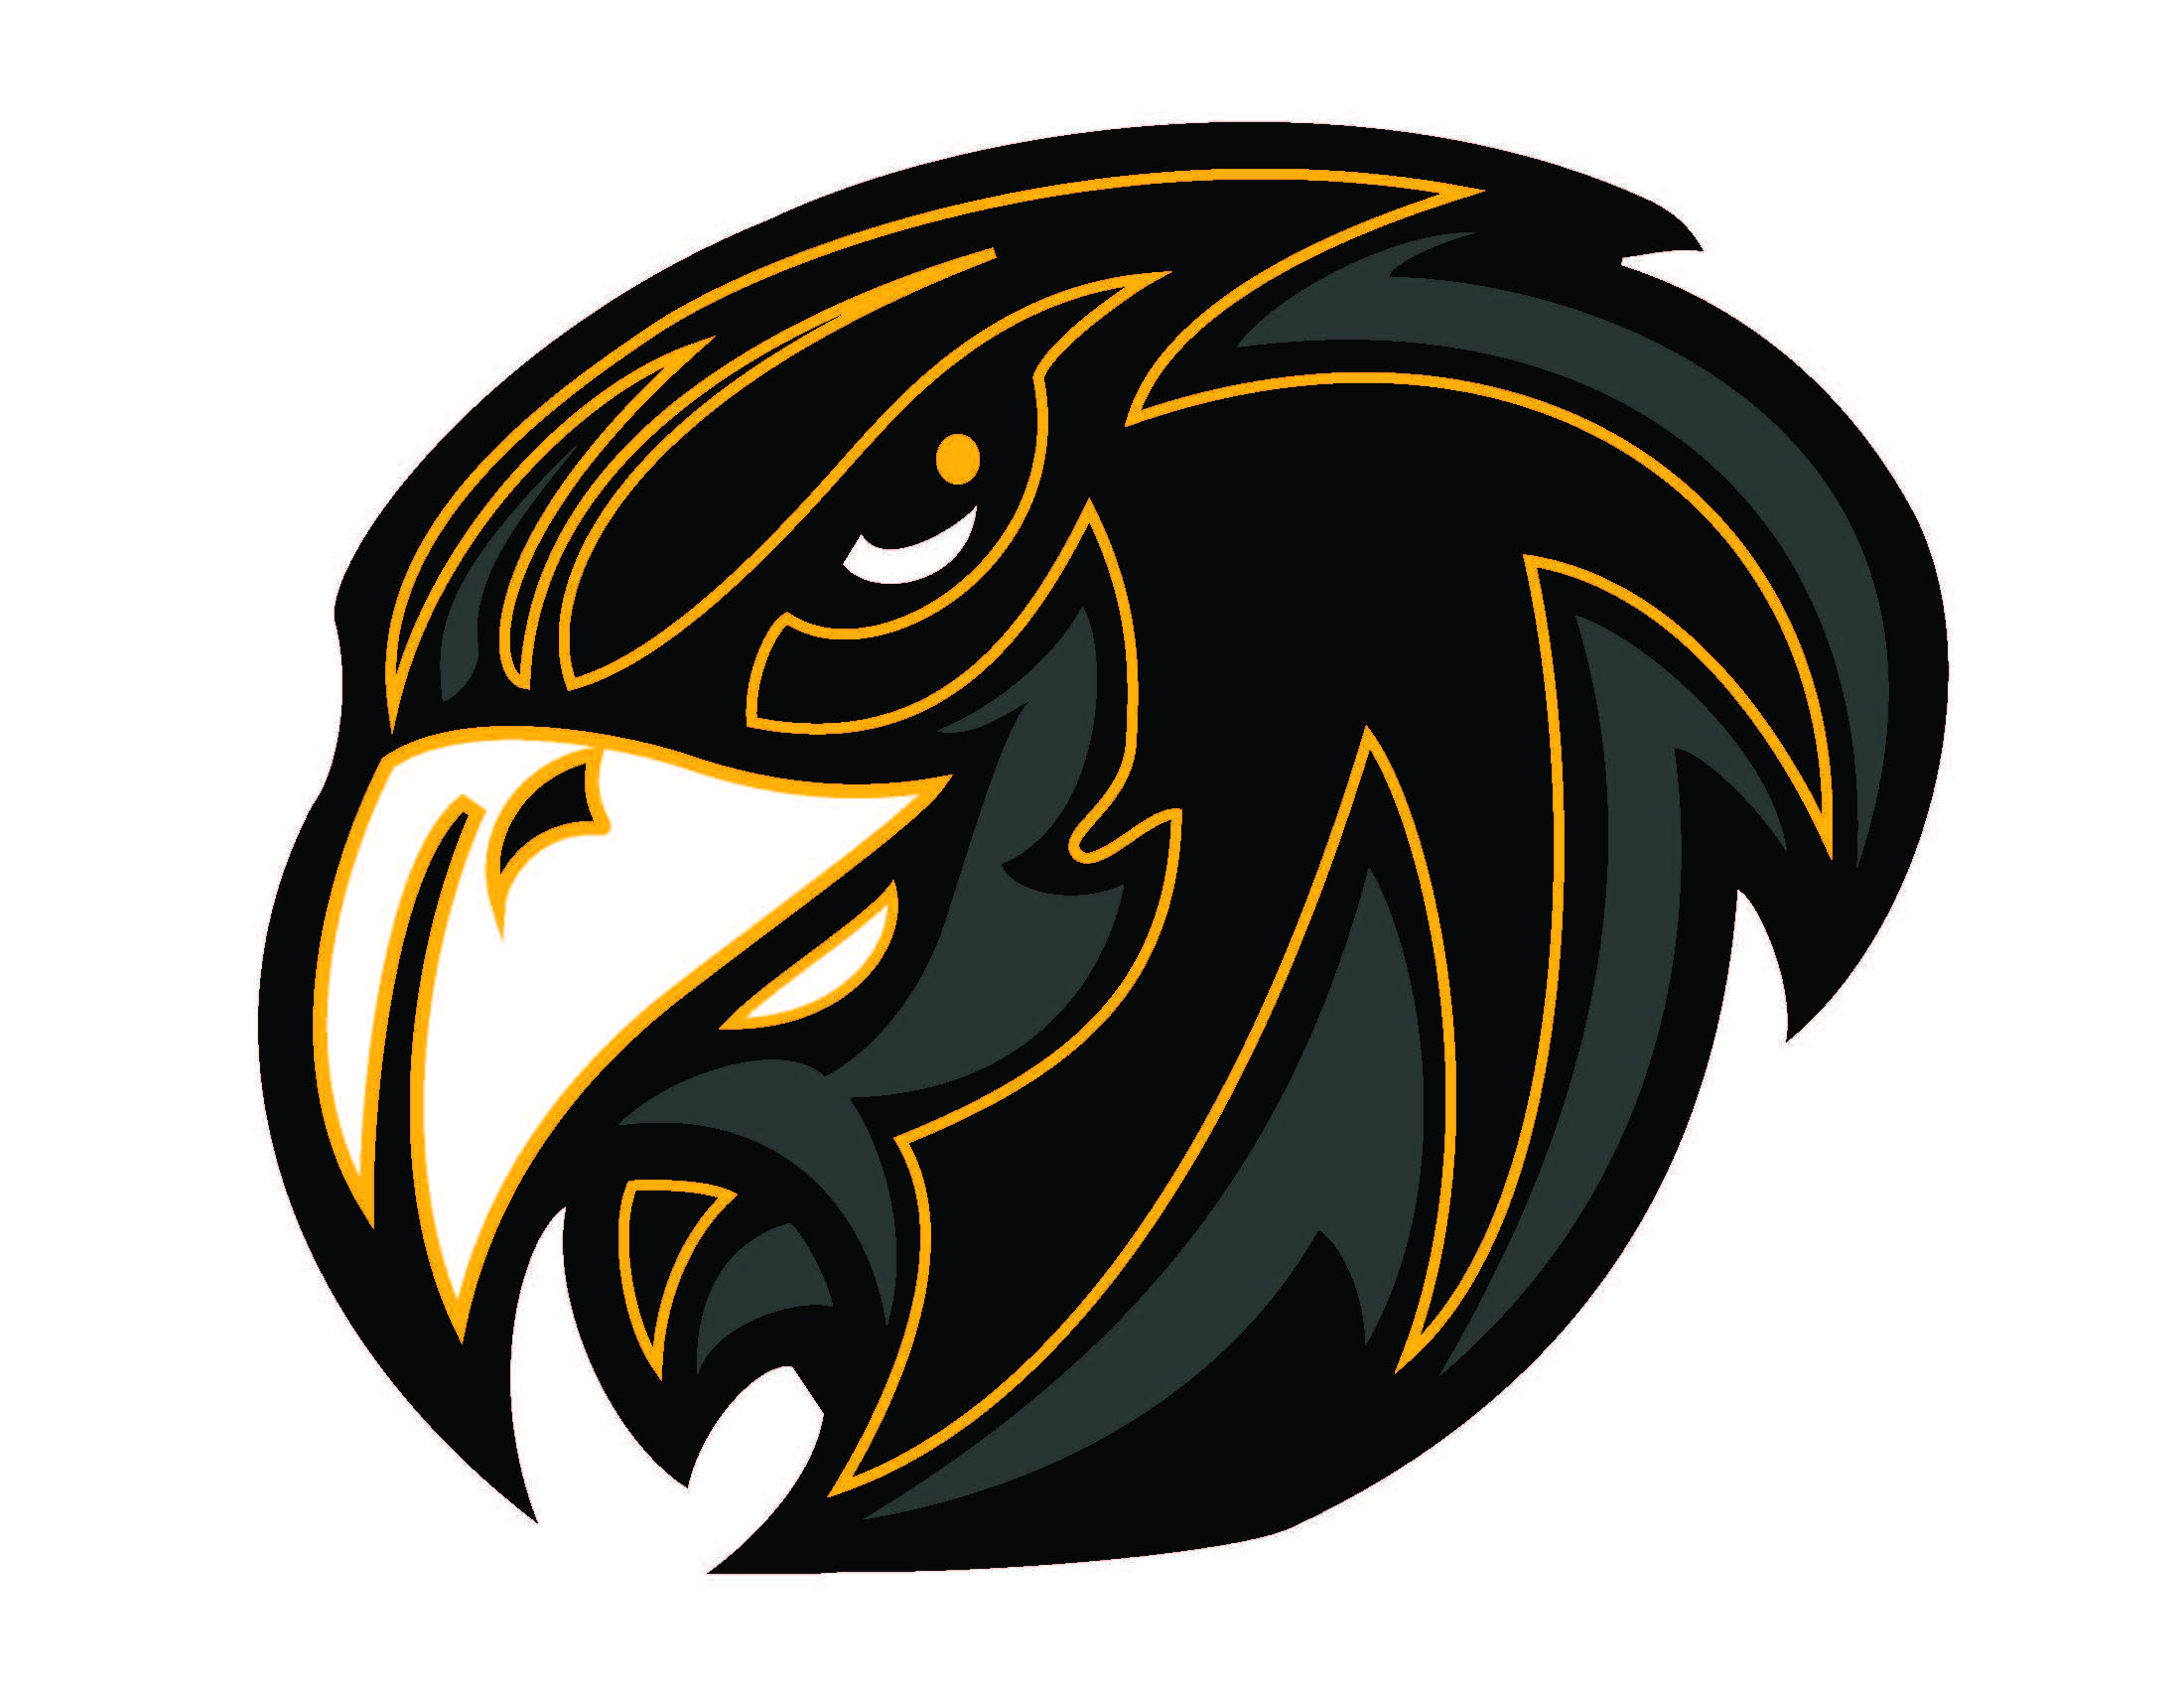 Football clipart hawk #3